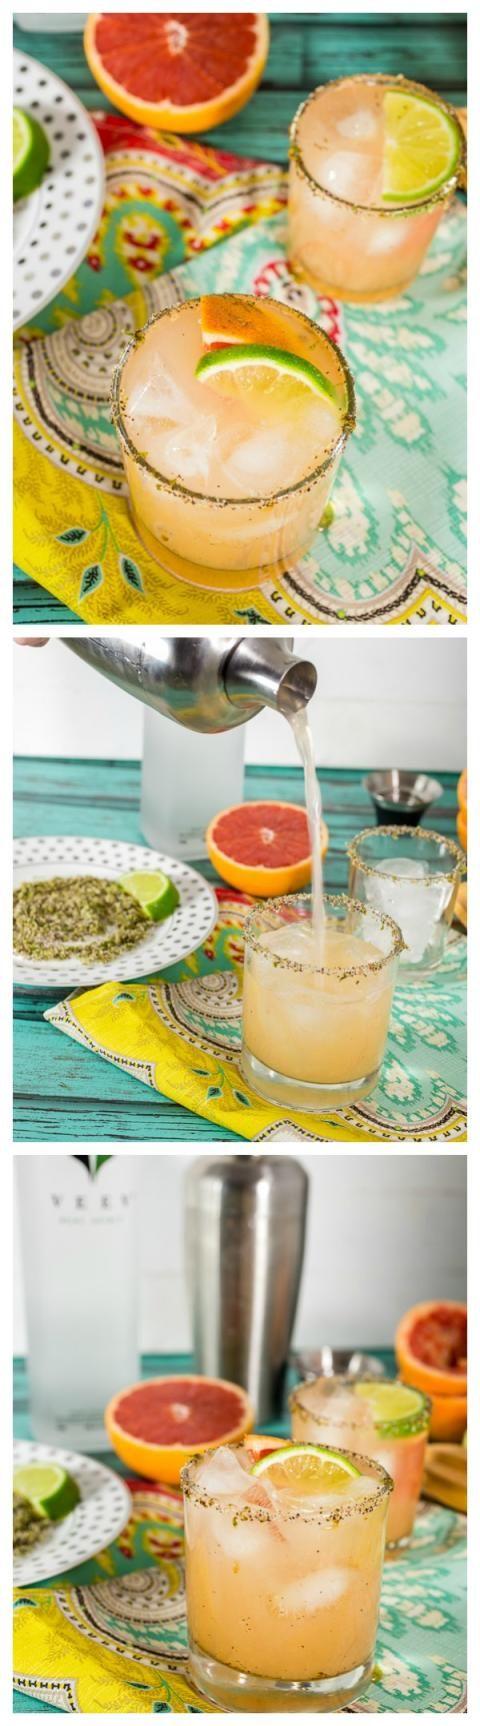 Grapefruit Margarita with Chili Lime Rim | girlinthelittleredkitchen.com